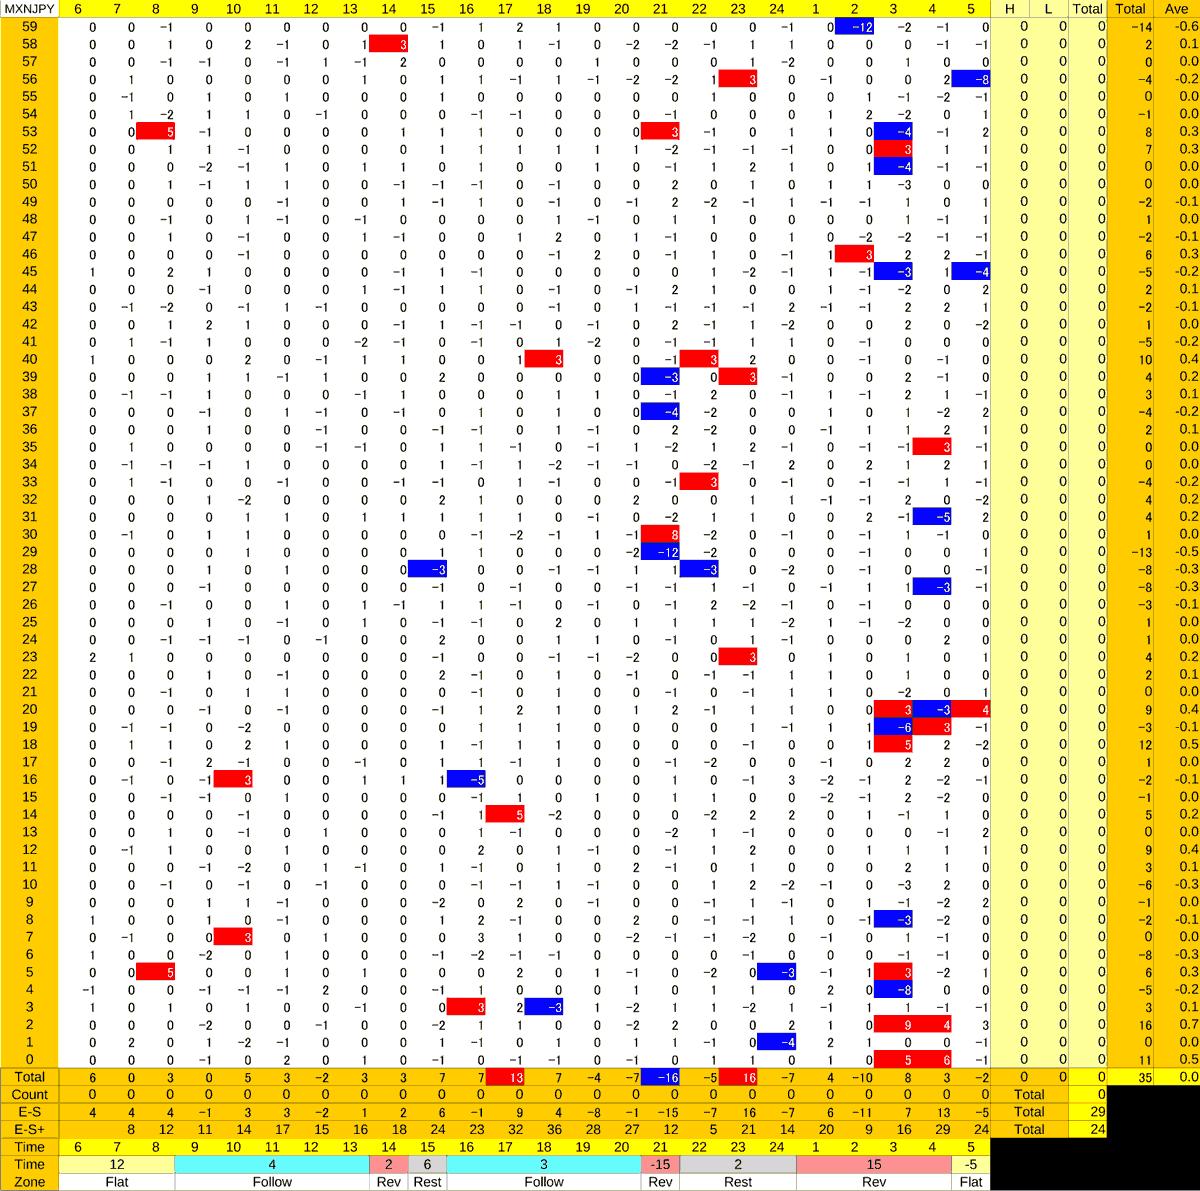 20200916_HS(3)MXNJPY